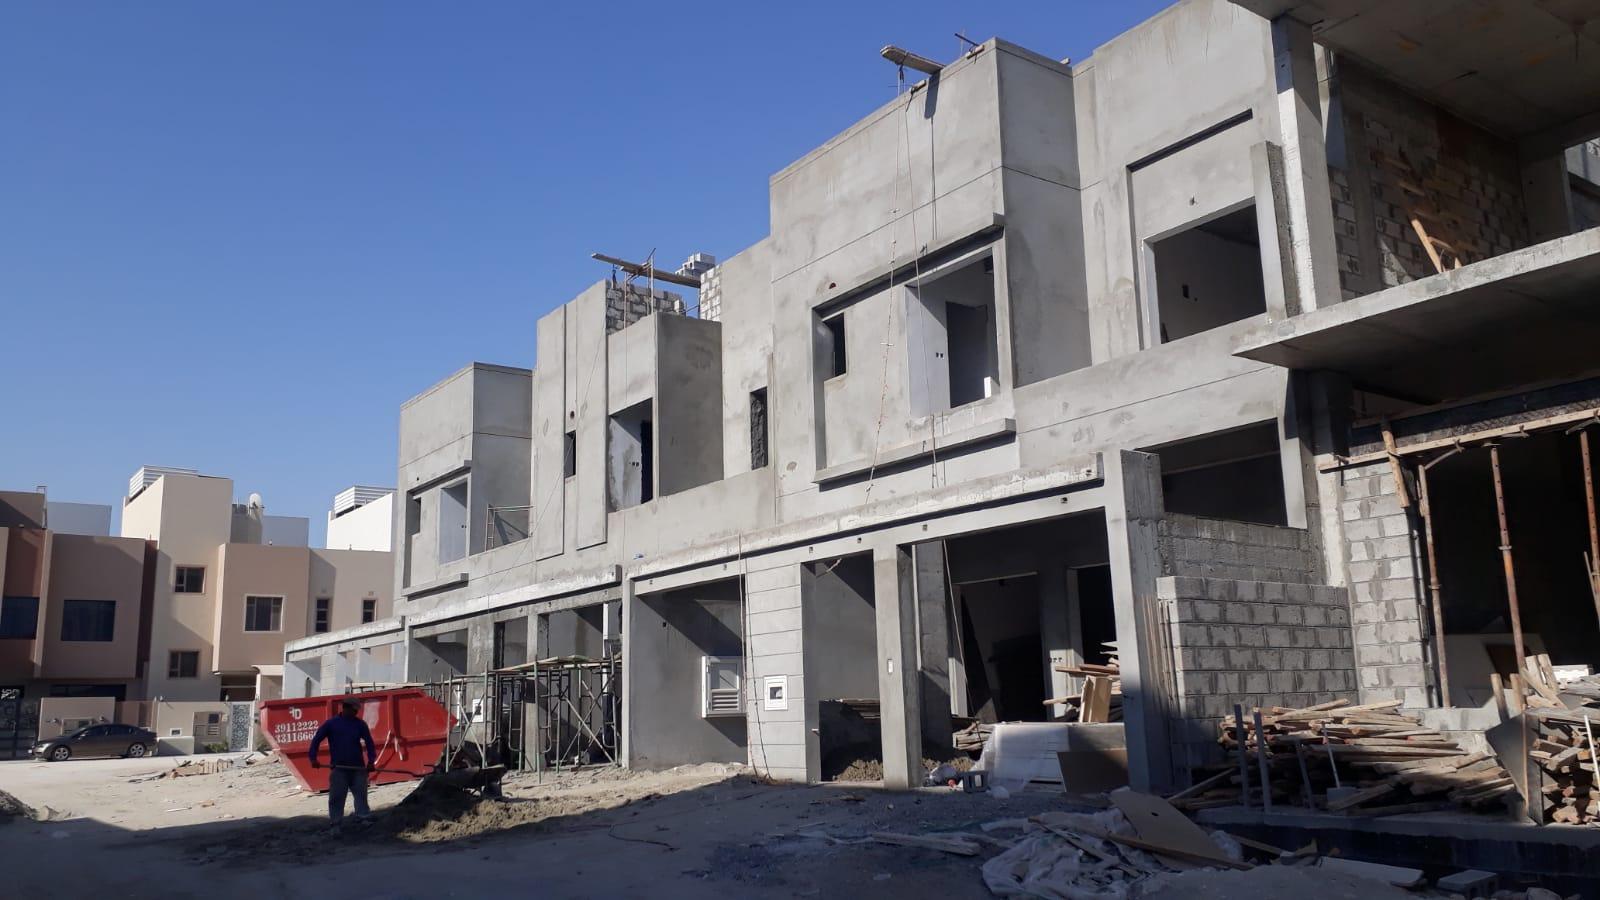 Villa for Sale Under construction in Maqsha. Ref: MAQ-MN-001